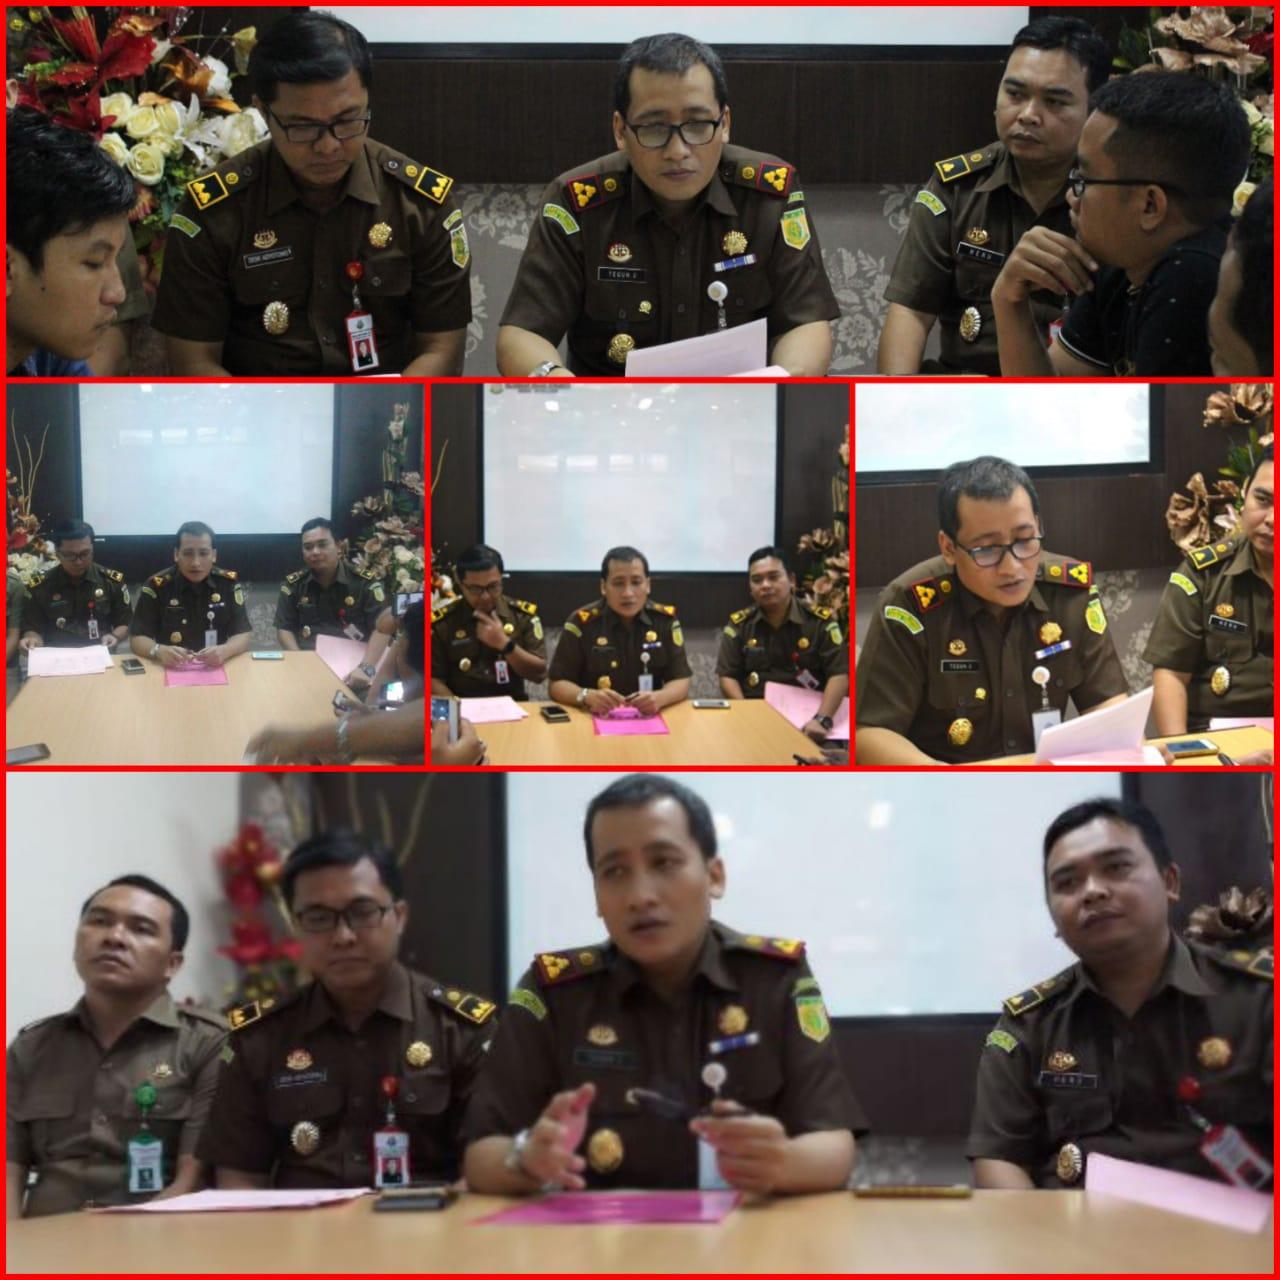 Press Conference Perkara Tindak Pidana Umum Dan Tindak Pidana Khusus Kejaksaan Negeri Surabaya 28-12-2017